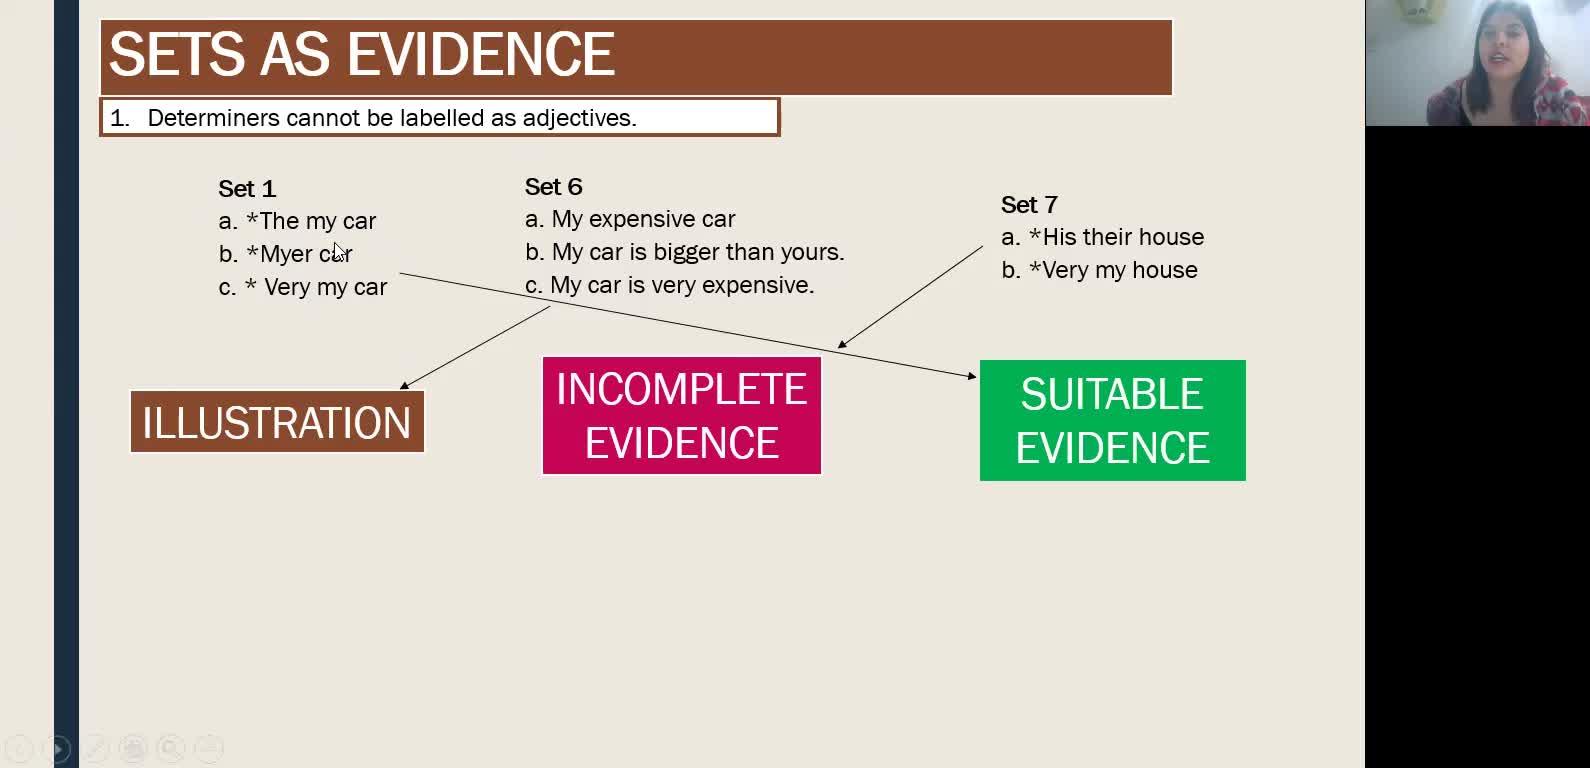 Modulo de Gramática - ILI - Statements